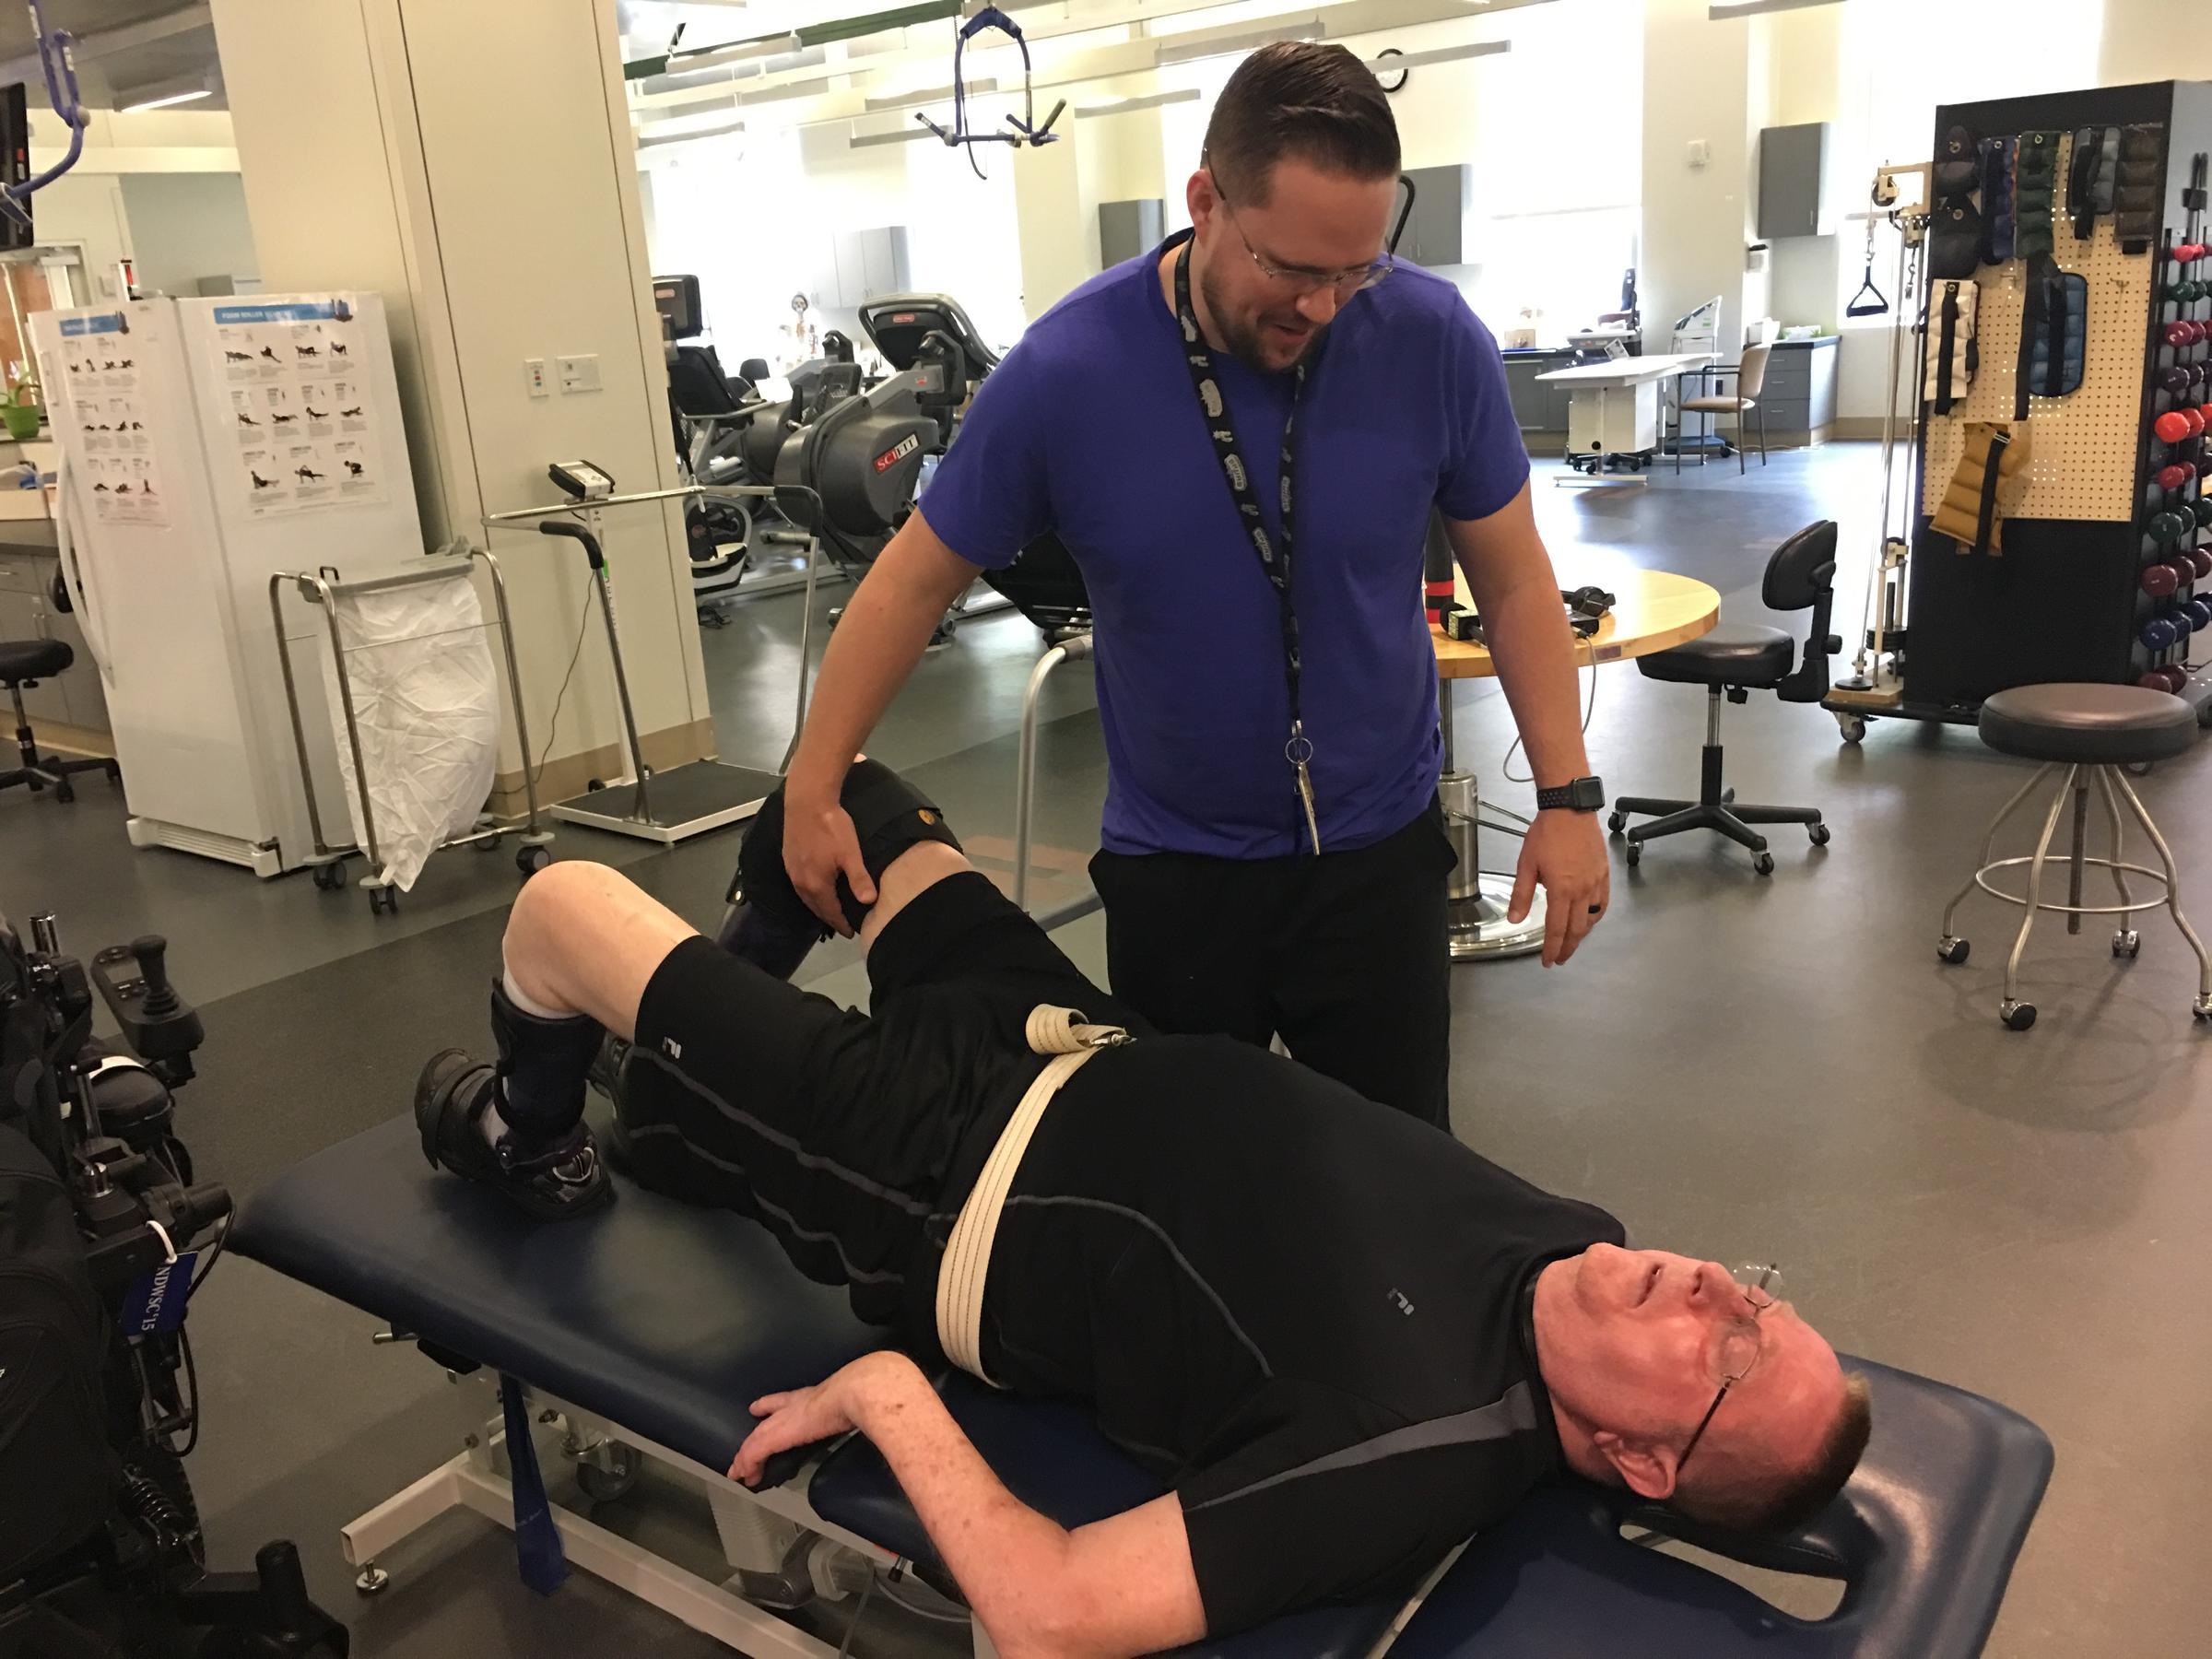 Polytrauma Rehab Helps Service Members And Veterans Heal